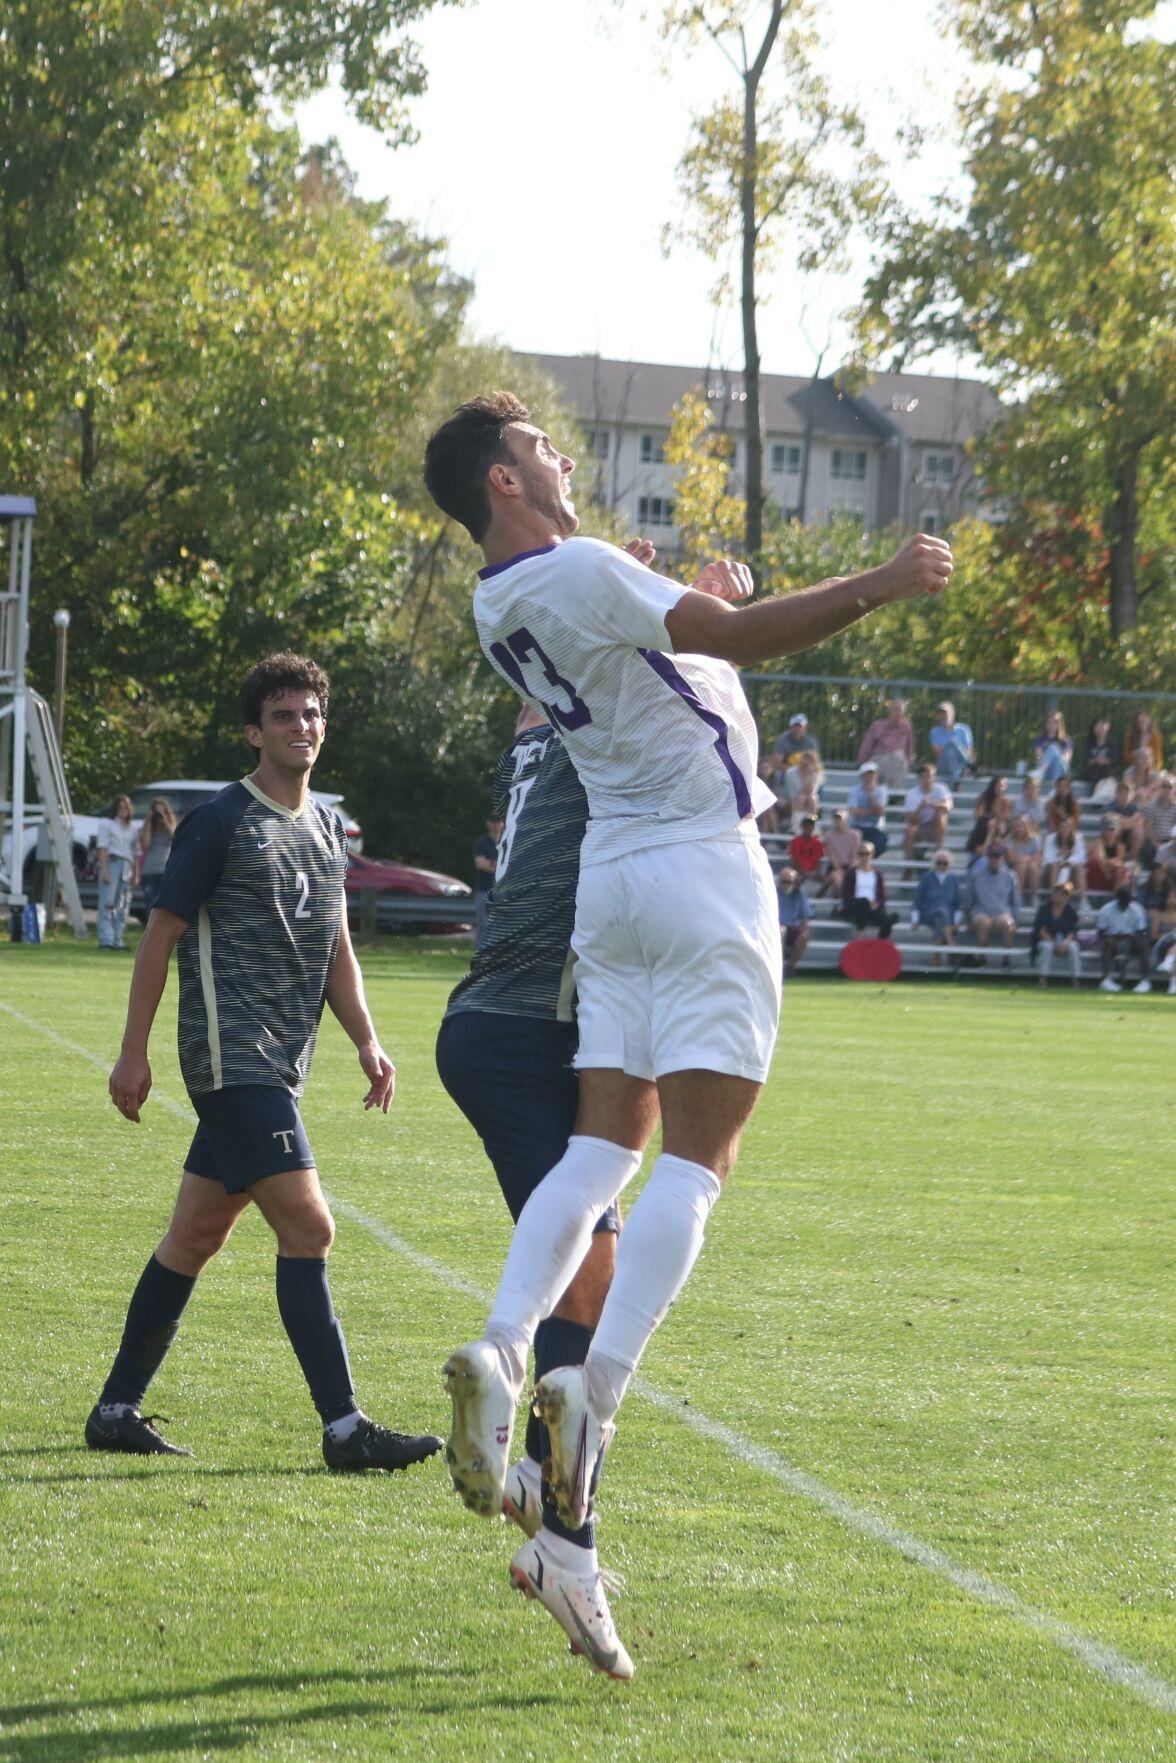 dan rayhill heads the ball